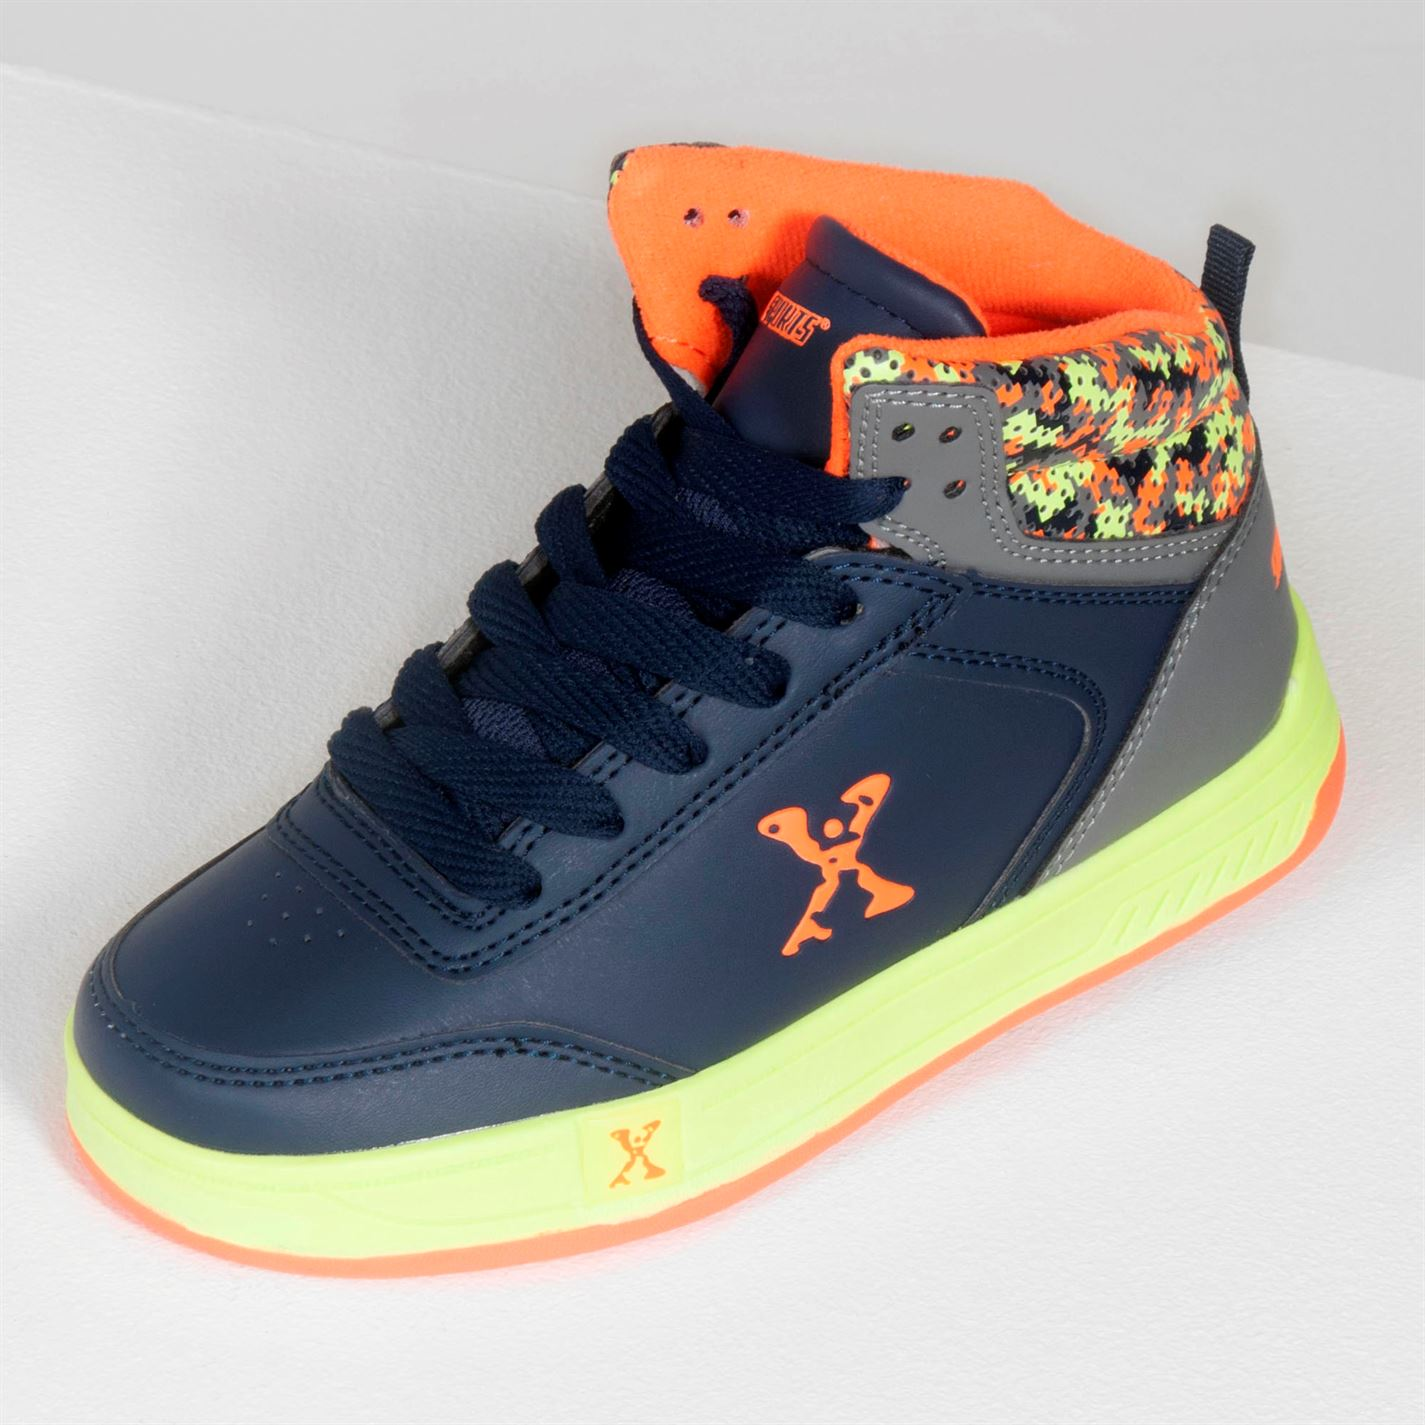 Sidewalk Sport Childrens Hi Top Boys Skate Laces Fastened Roller Shoes Footwear